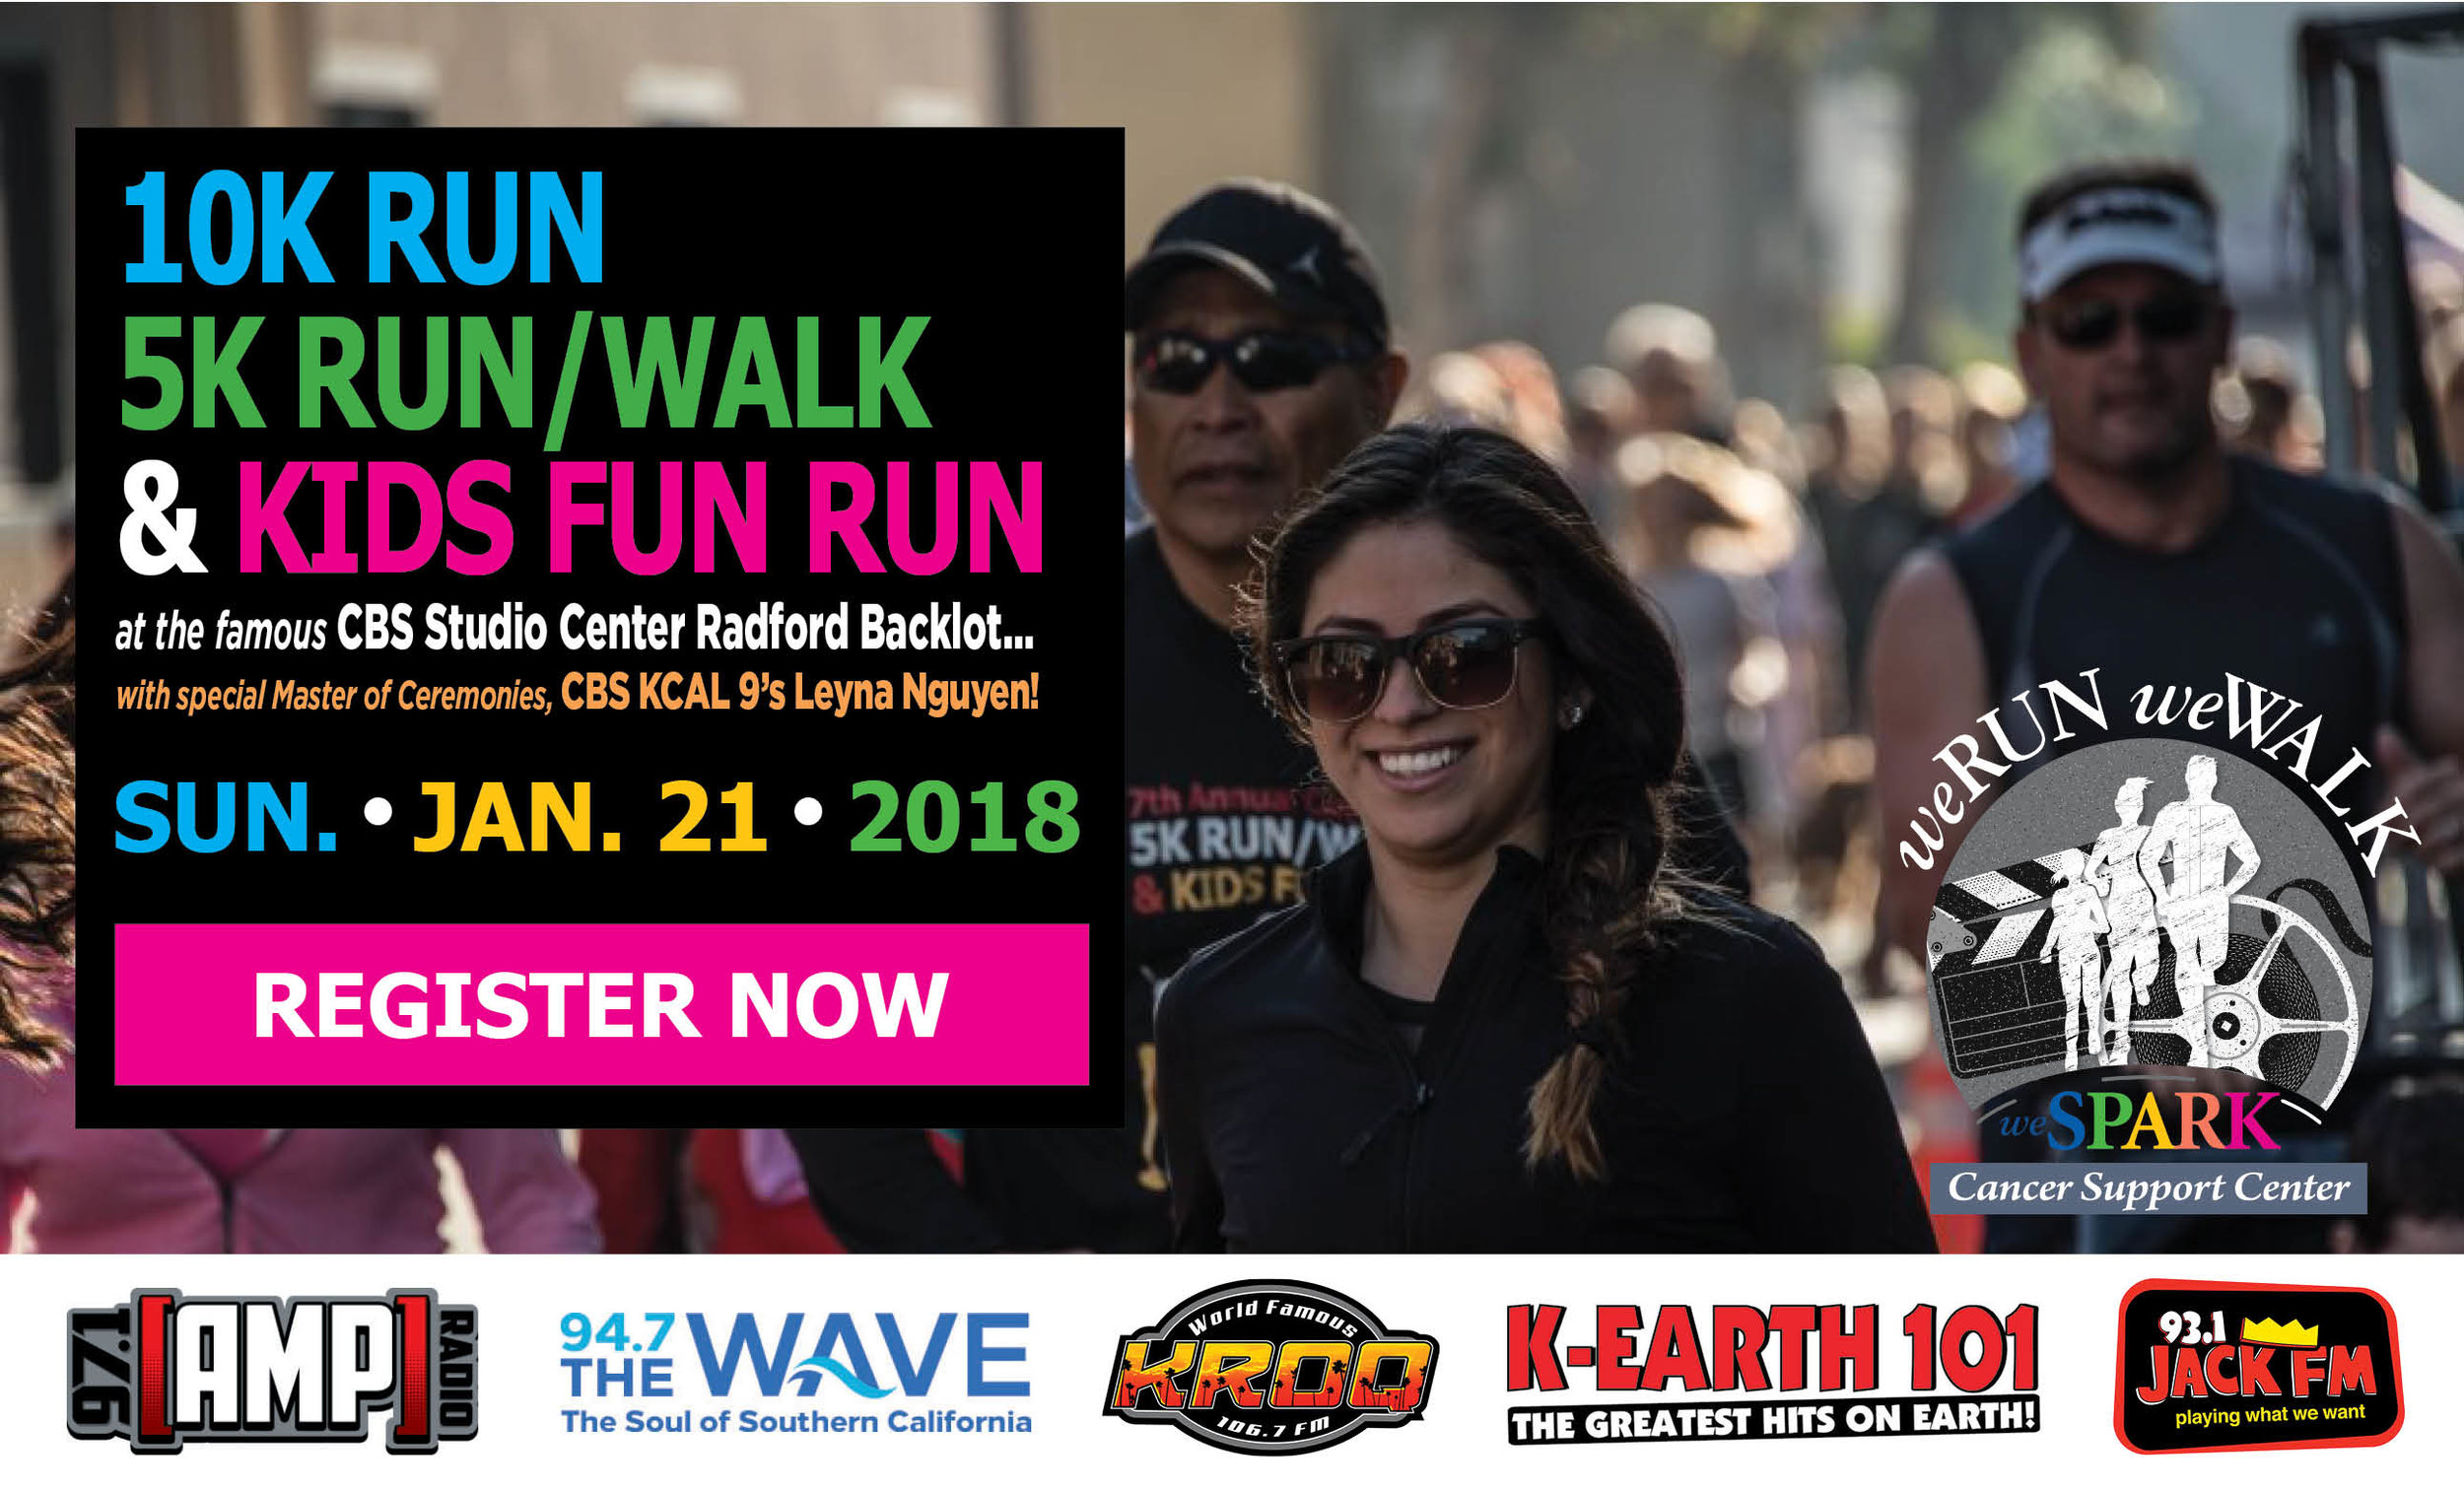 3-weSPARK-Run-Walk-Event-page-Ad-300dpi-1.jpg